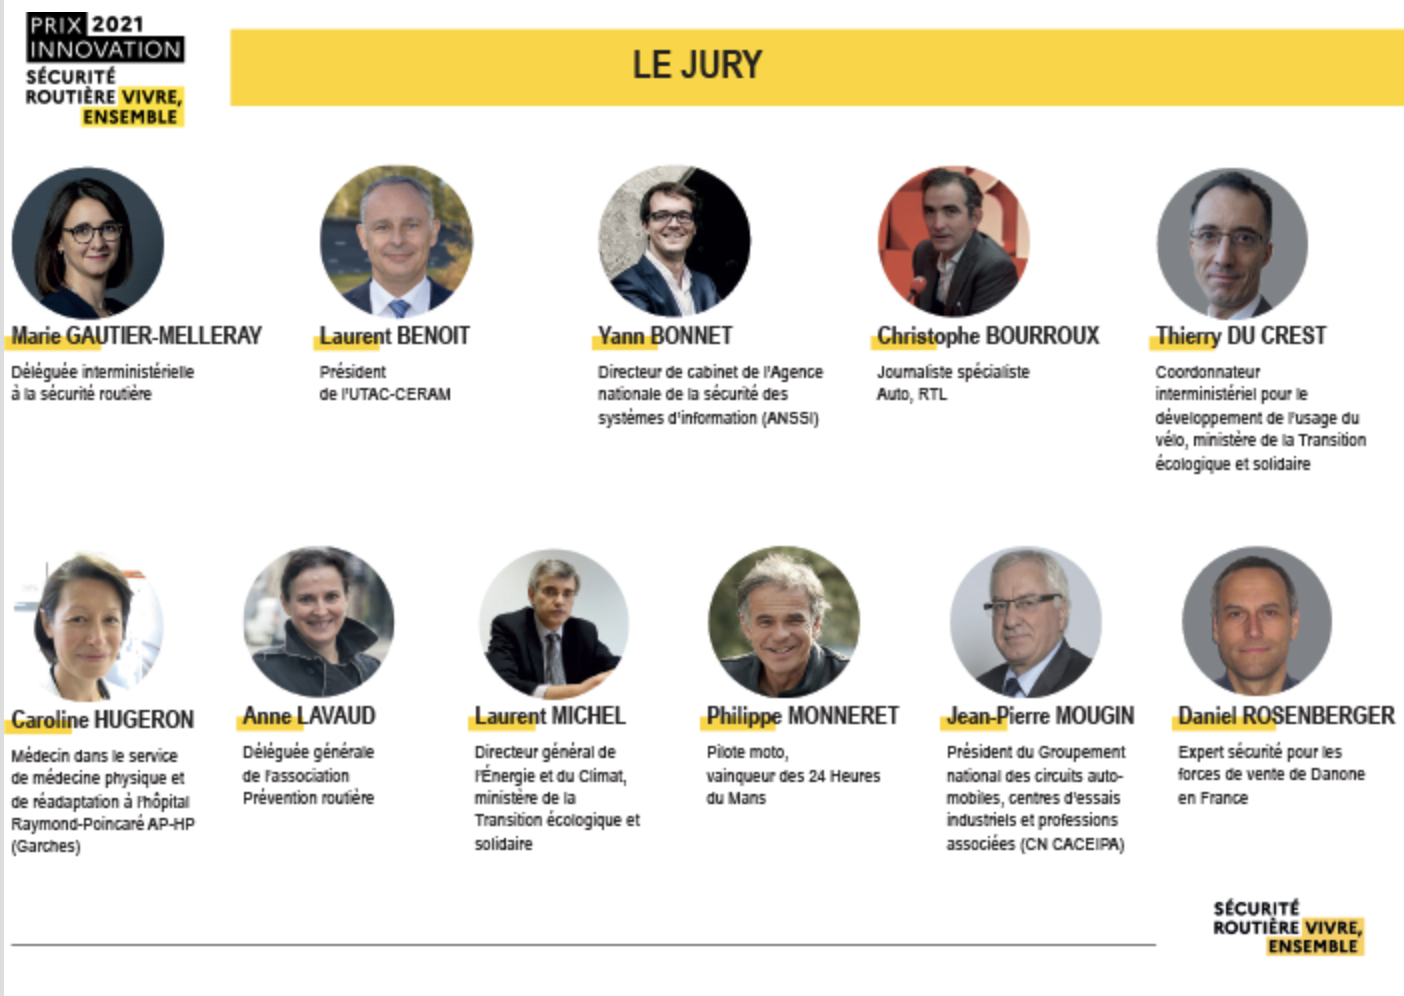 jury 2021 new